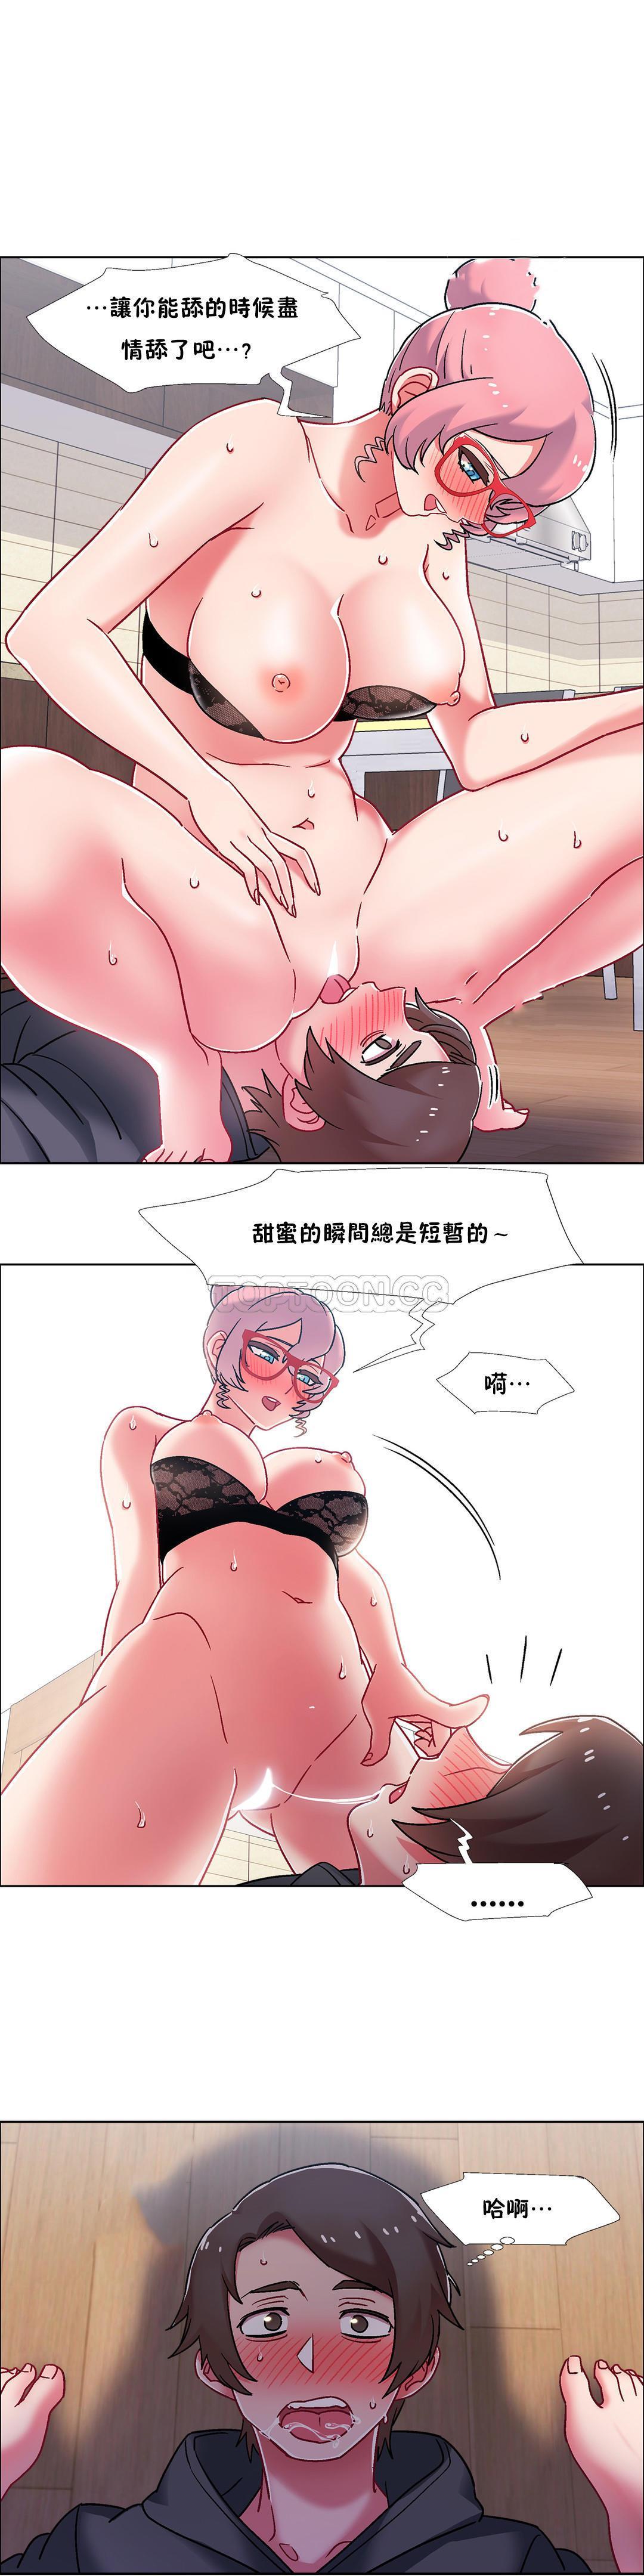 [Studio Wannabe] Rental Girls | 出租女郎 Ch. 33-58 [Chinese]  第二季 完结 363